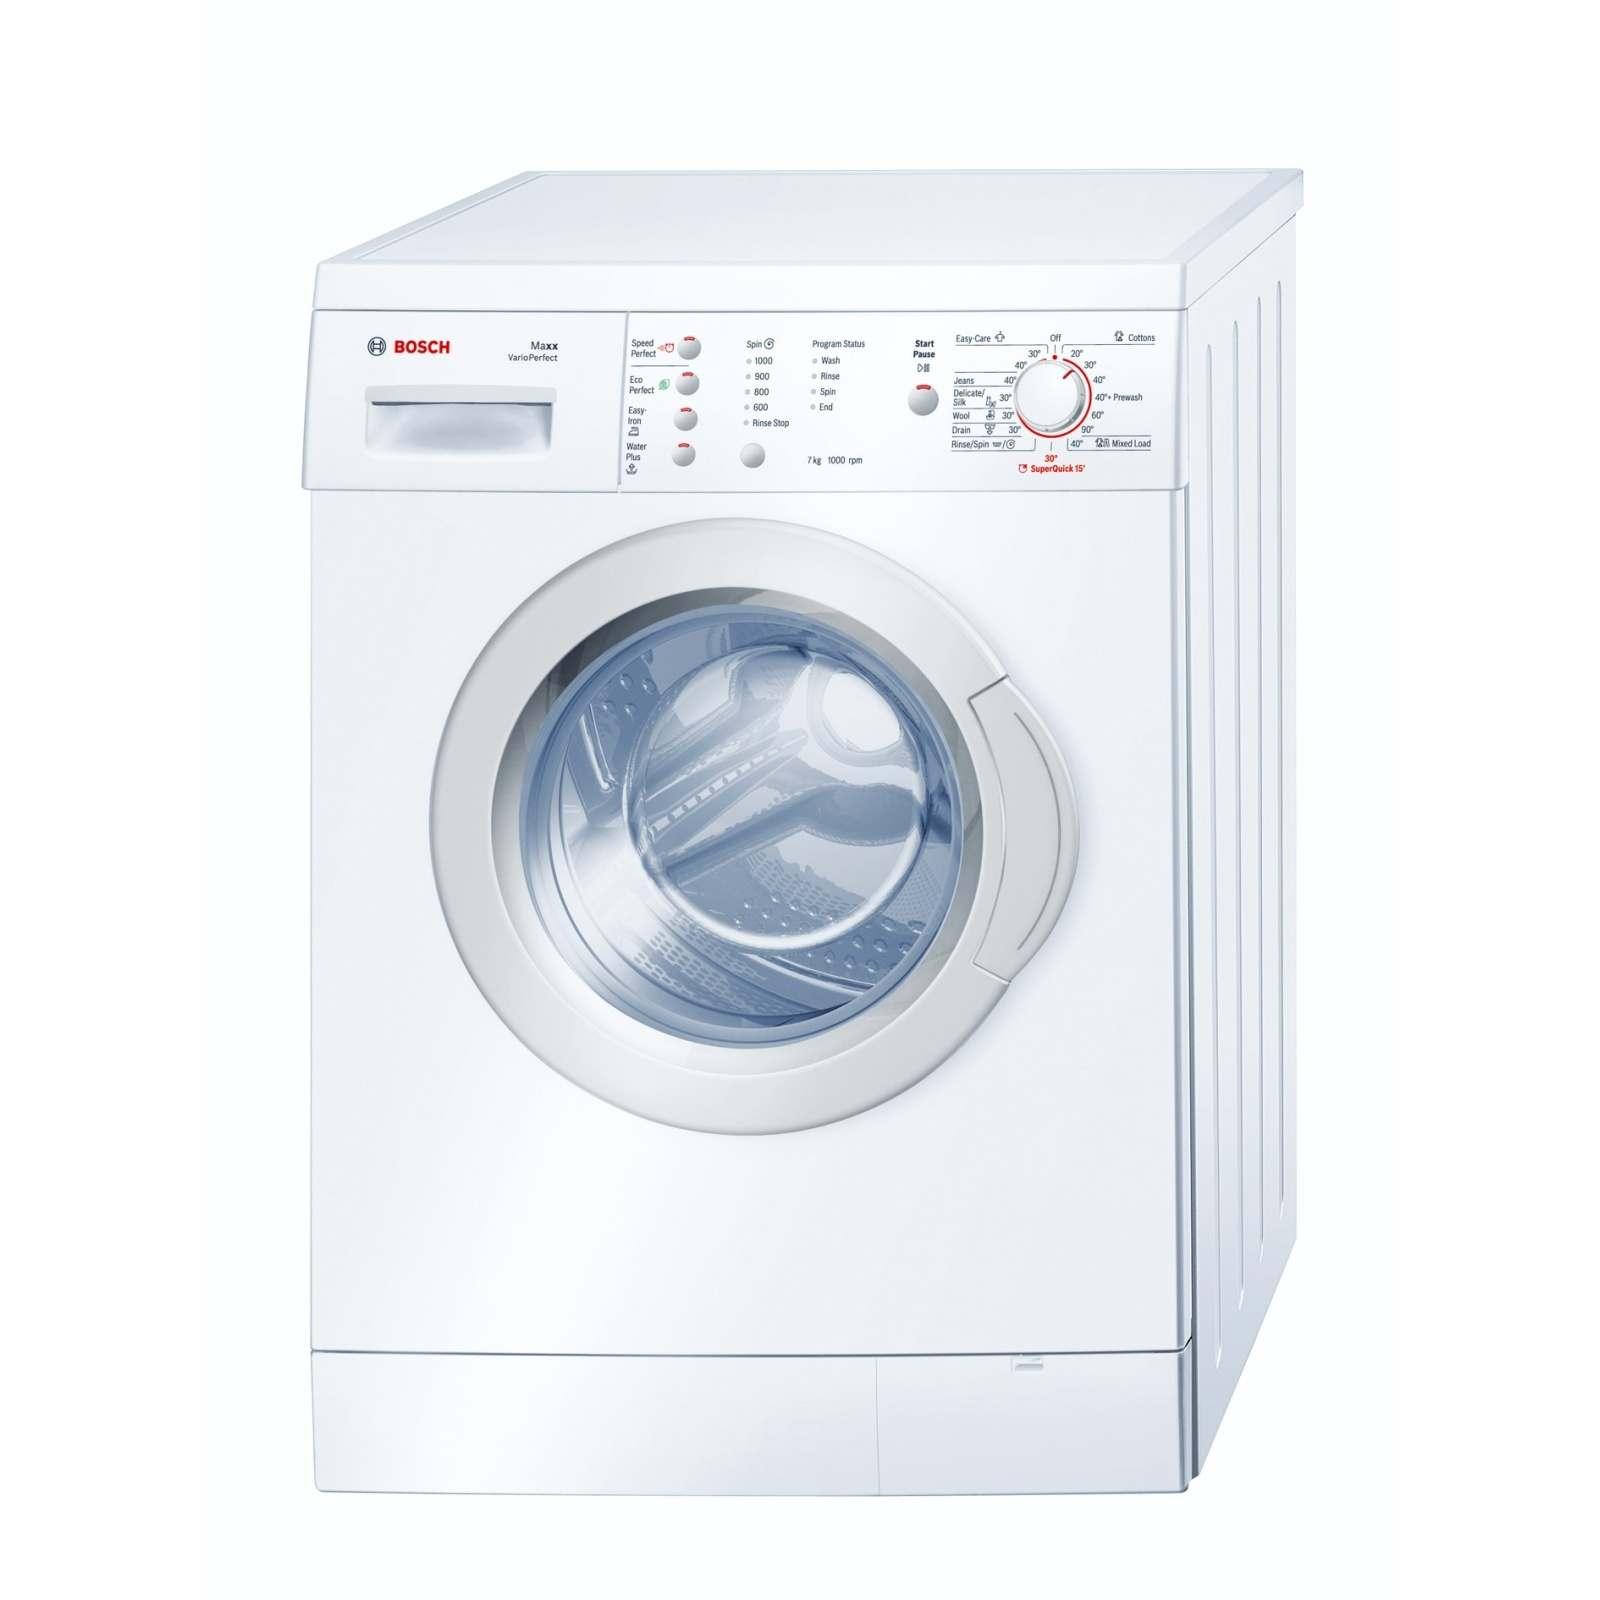 Bosch WAE ZA 7KG Front Load Washing Machine